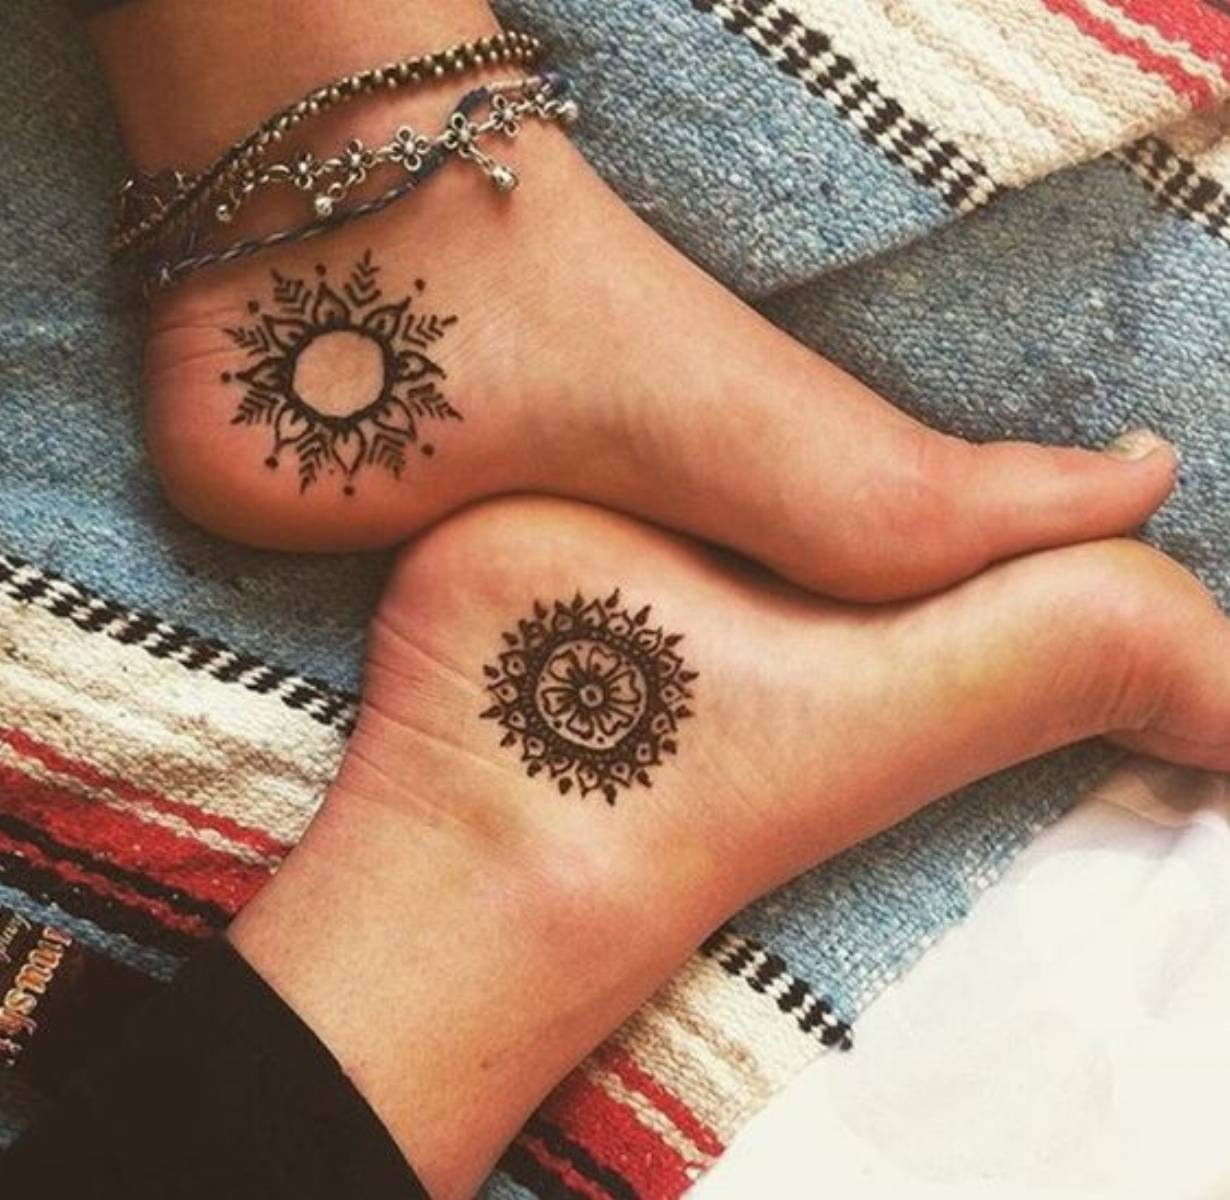 modne tatuaże w 2017